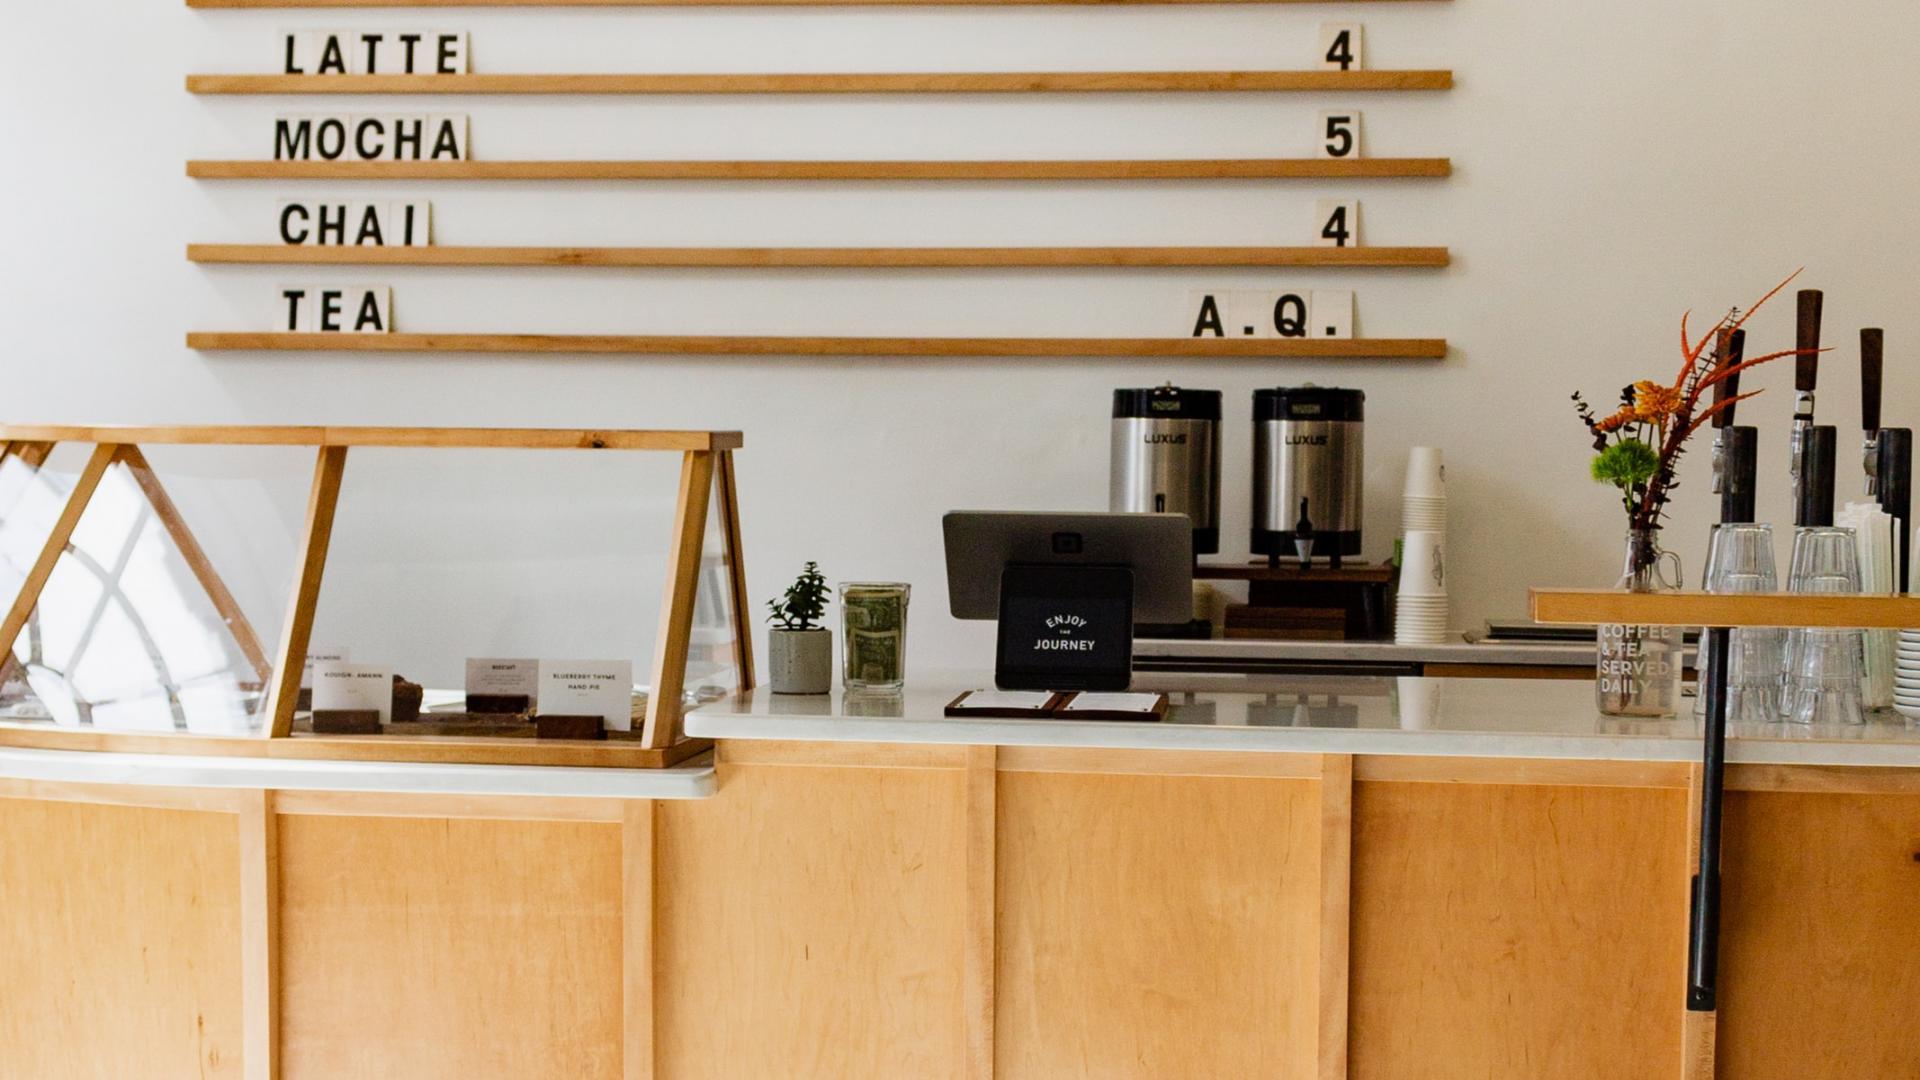 Kaffee Preise